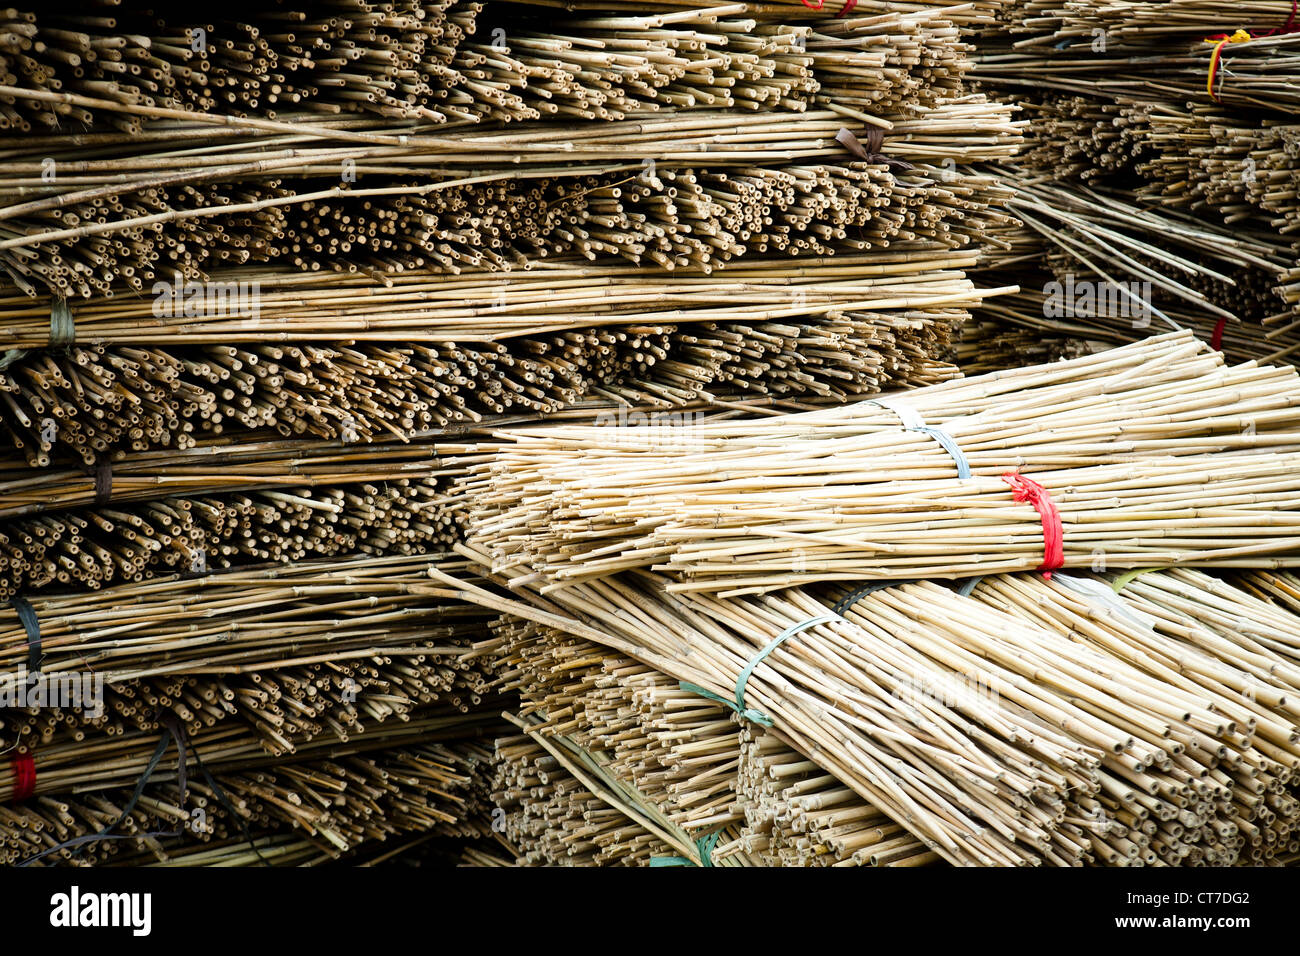 Stack of bamboo wood bundles - Stock Image